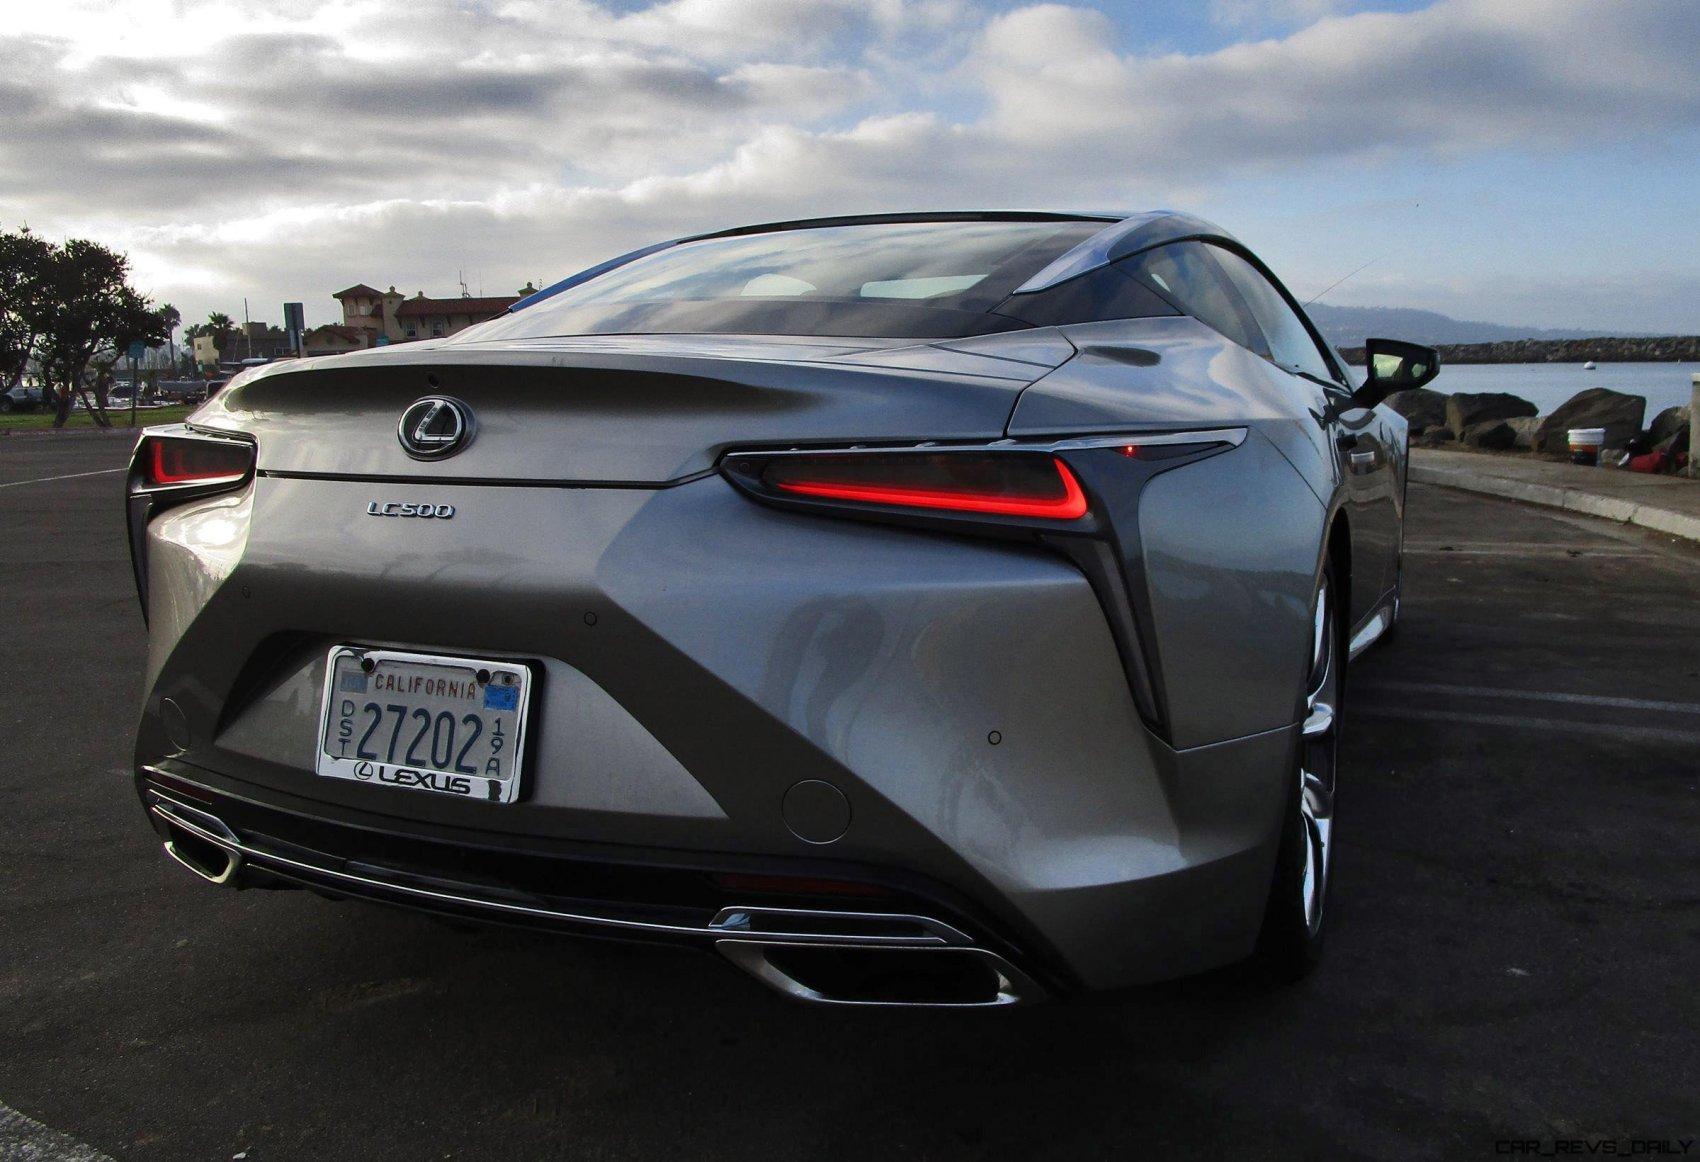 http://www.car-revs-daily.com/wp-content/uploads/2017/10/2018-Lexus-LC500-Review-6.jpg